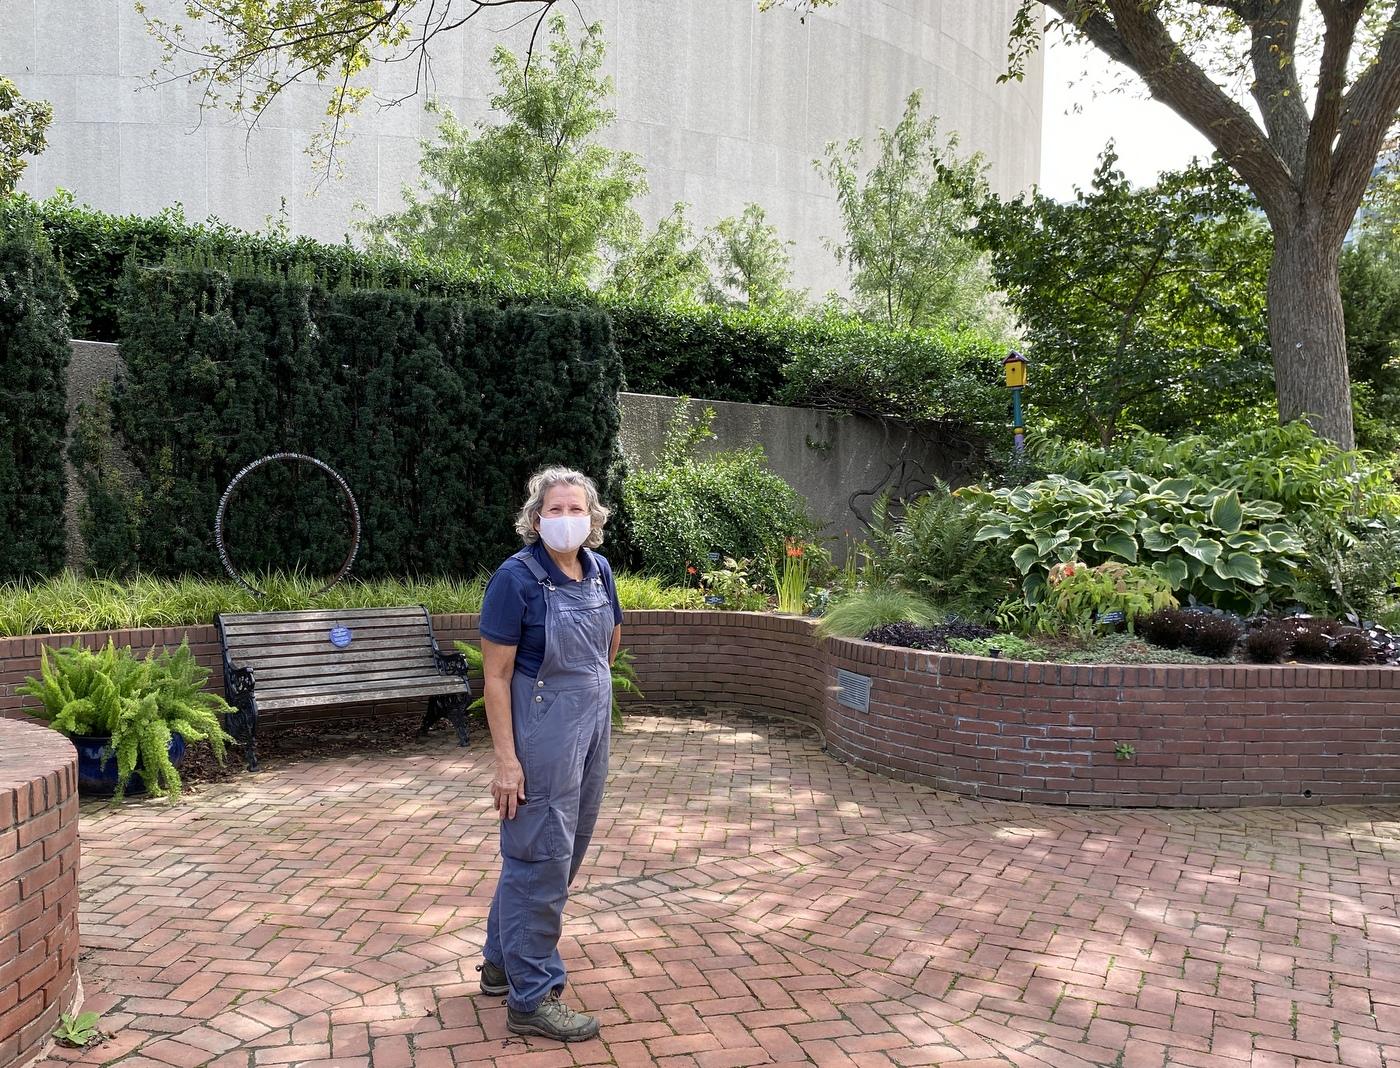 Janet Draper in Ripley Garden of Smithsonian September 2020